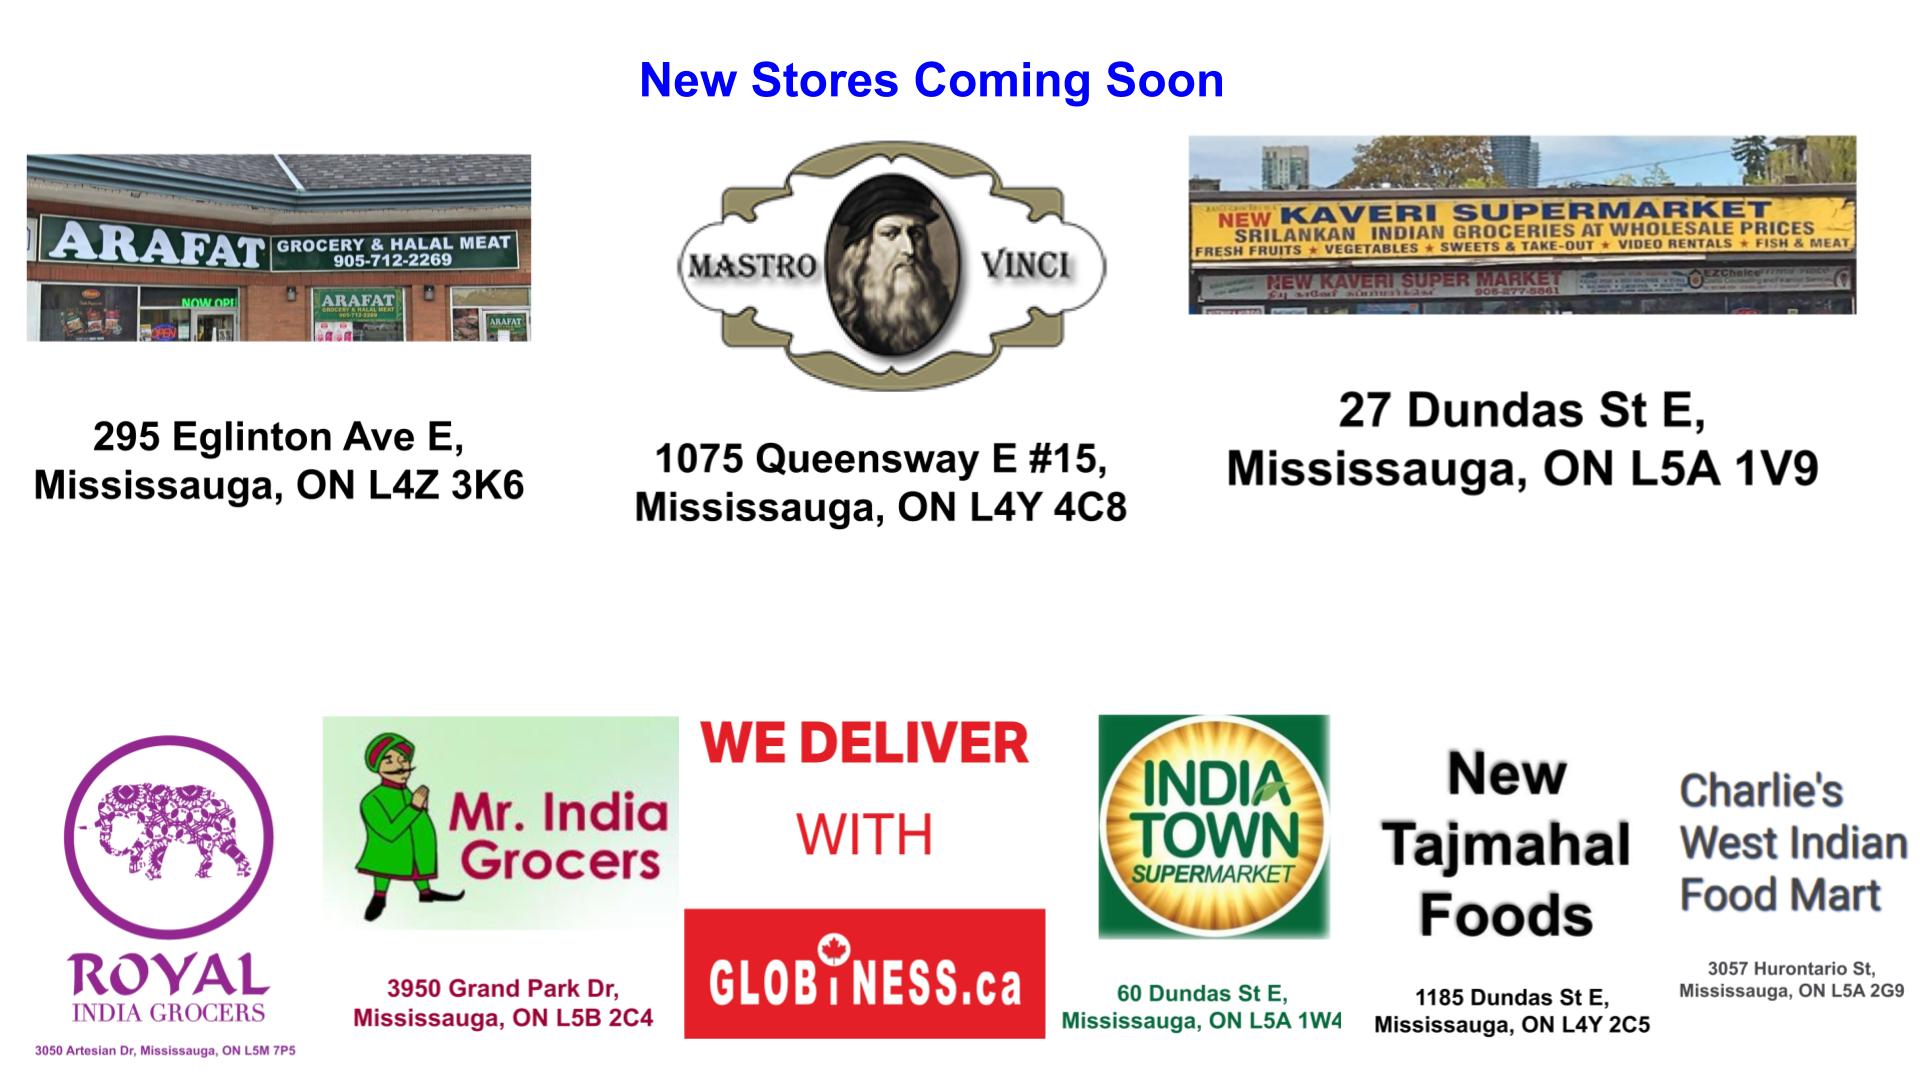 New Stores & Coming Soon Mastro Vinci, Arafat Grocery